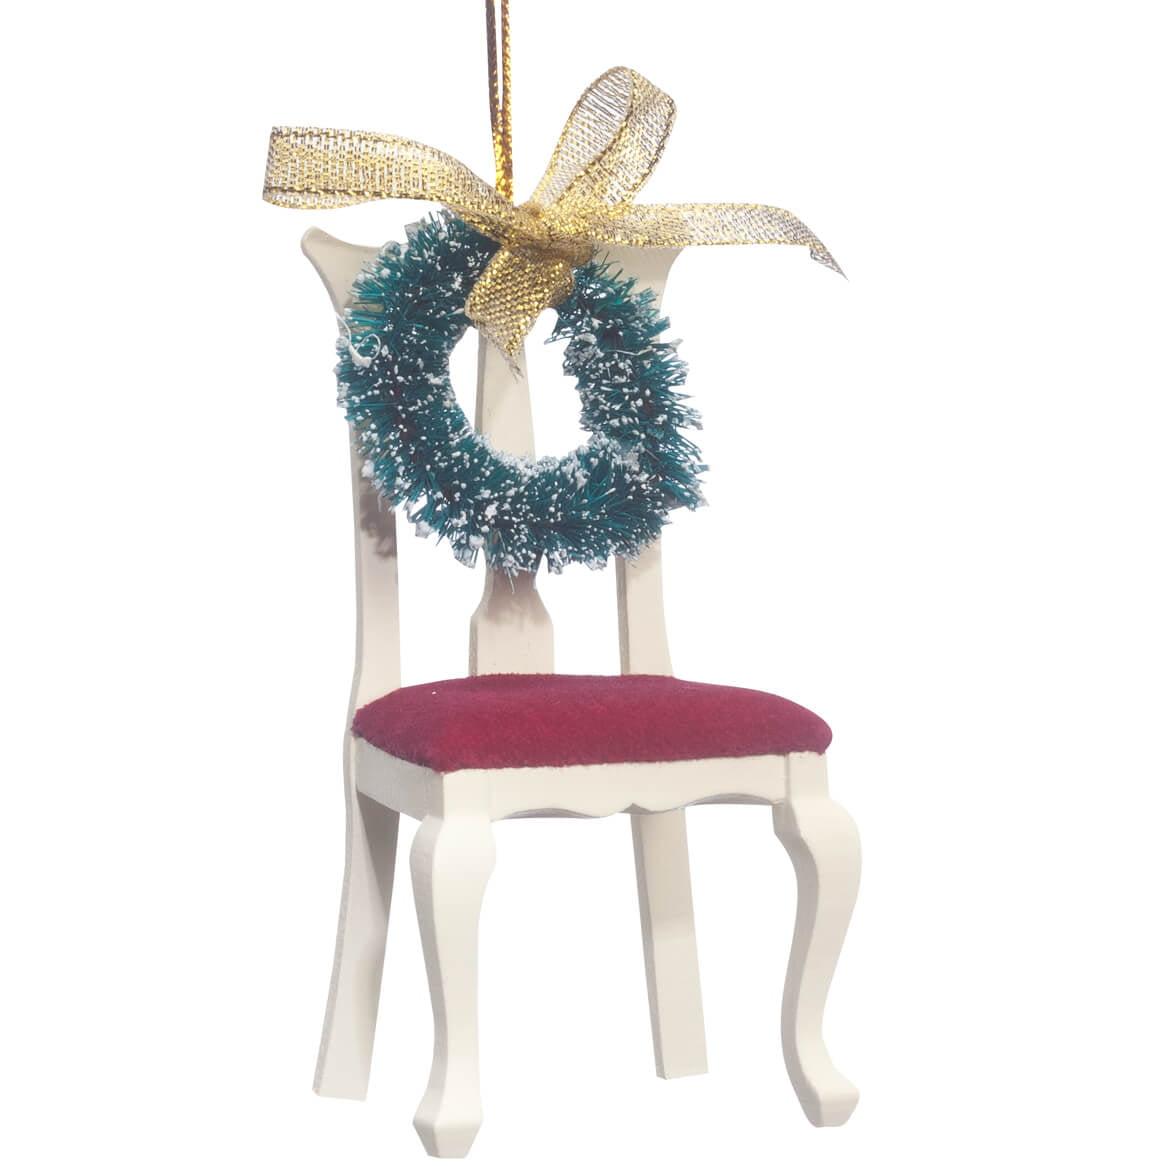 An Empty Chair Ornament